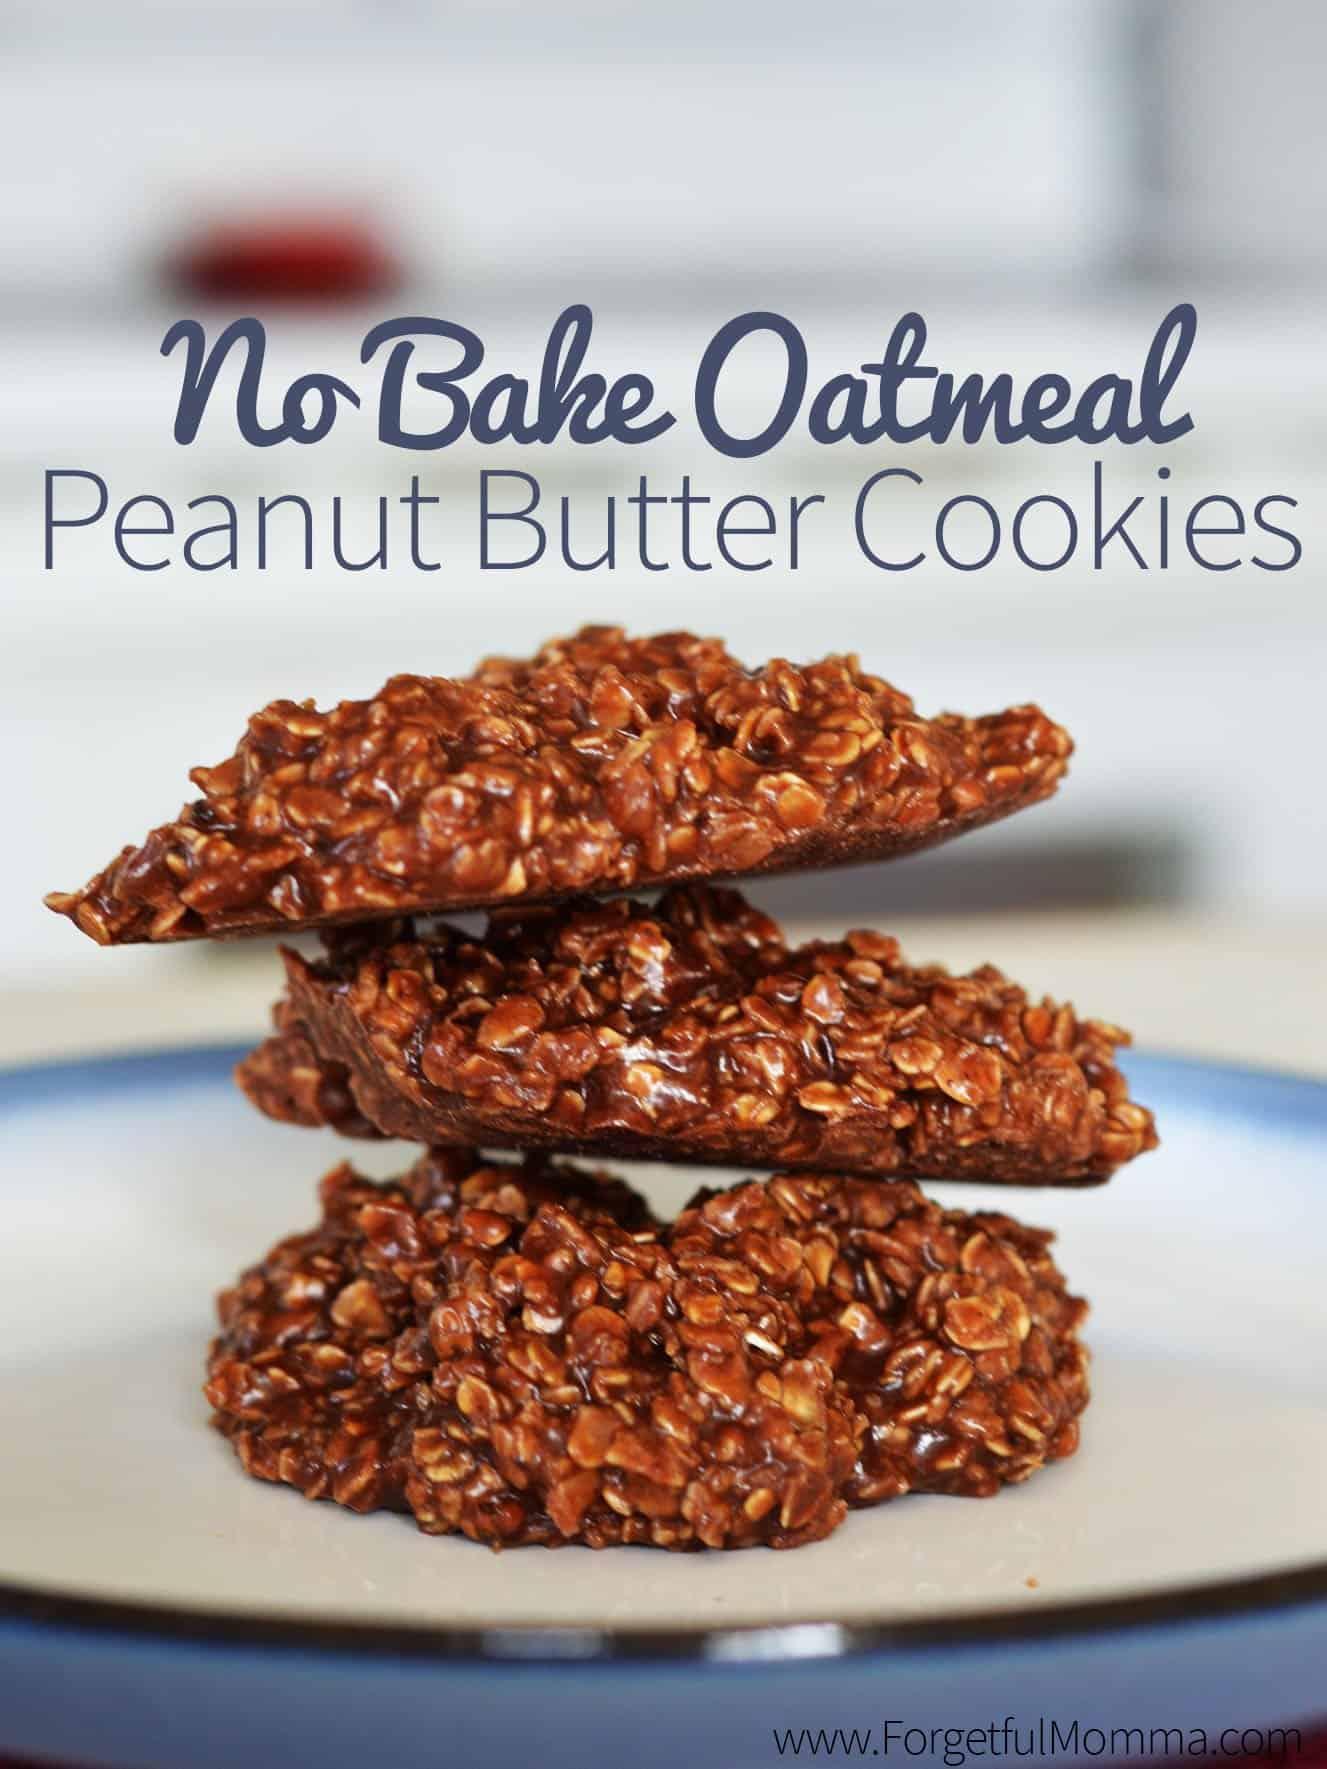 No Bake Oatmeal Peanut Butter Cookies